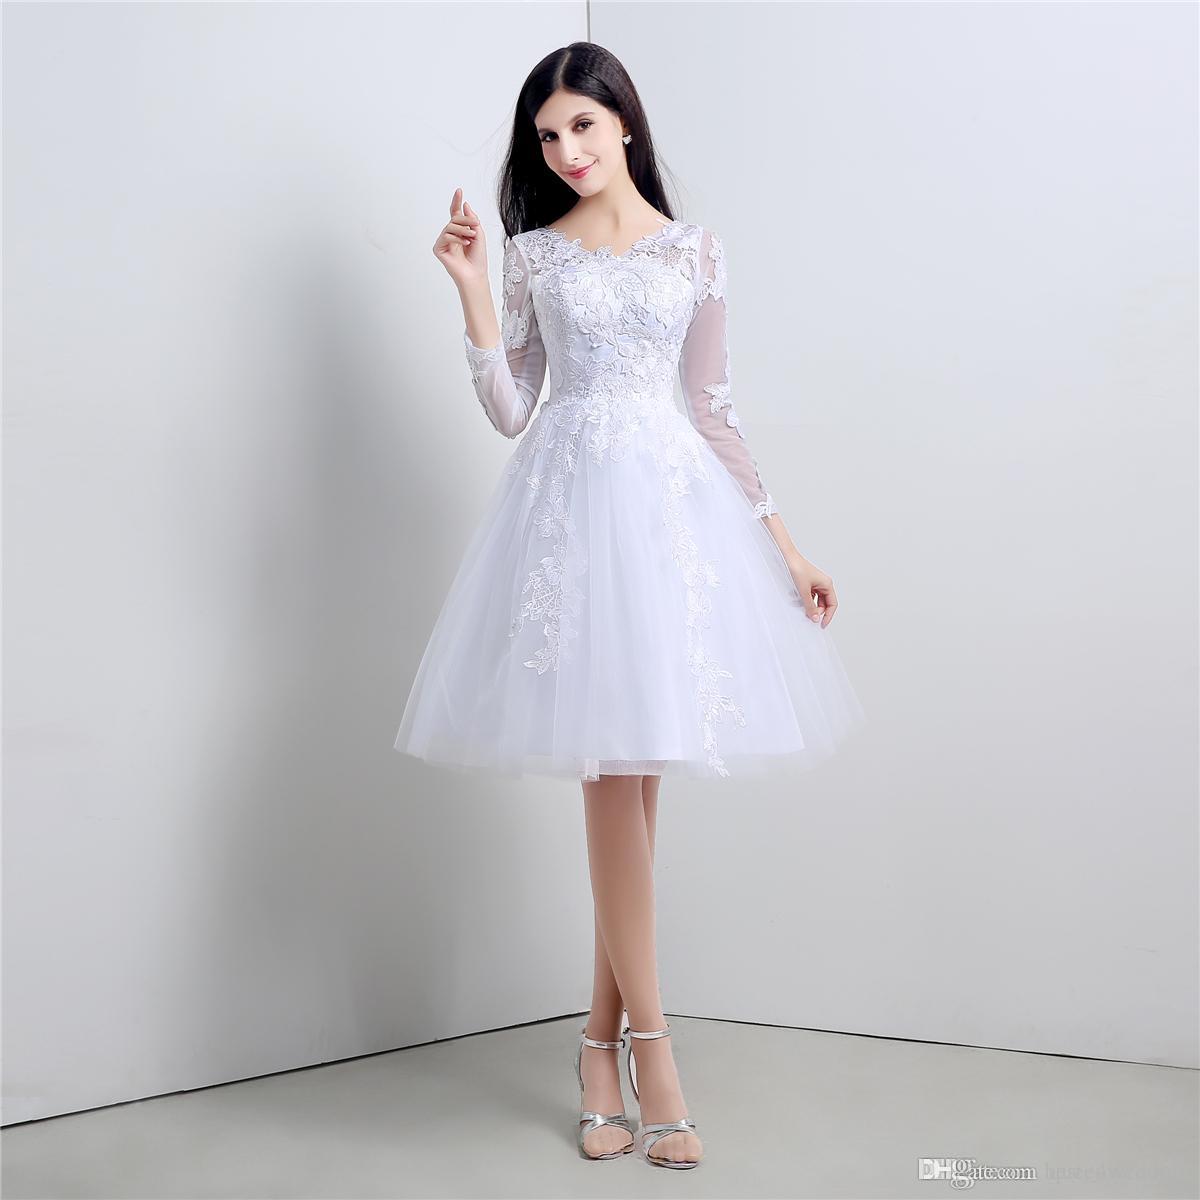 Youthful short wedding dresses knee length cheap stockings bridal youthful short wedding dresses knee length cheap stockings bridal gowns with long sleeves white black ombrellifo Gallery